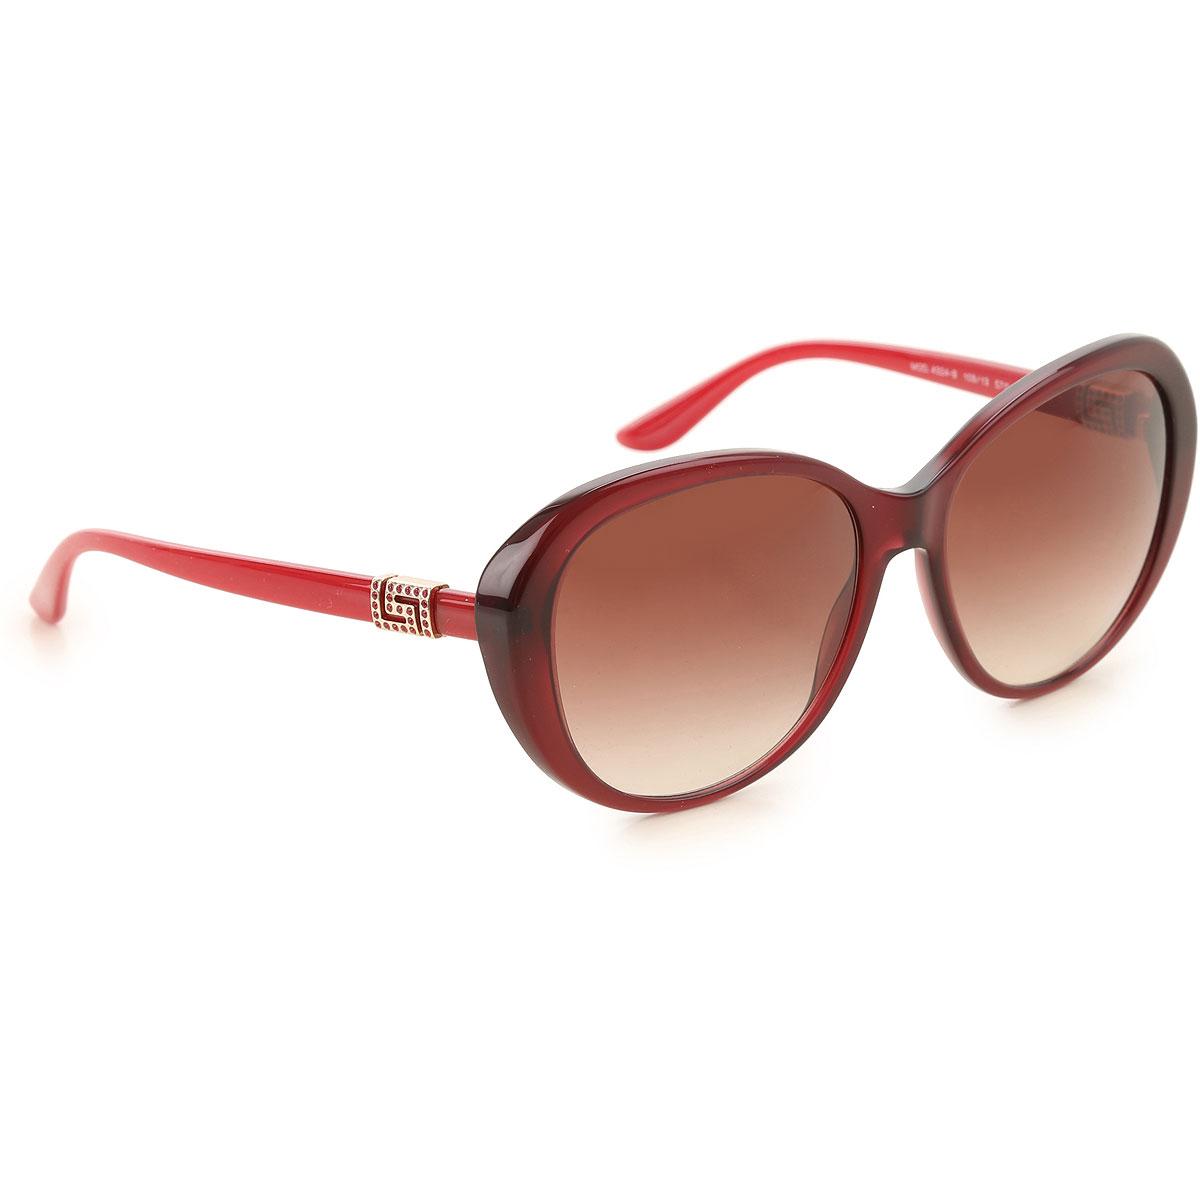 Gianni Versace Sunglasses On Sale, Burgundy, 2019